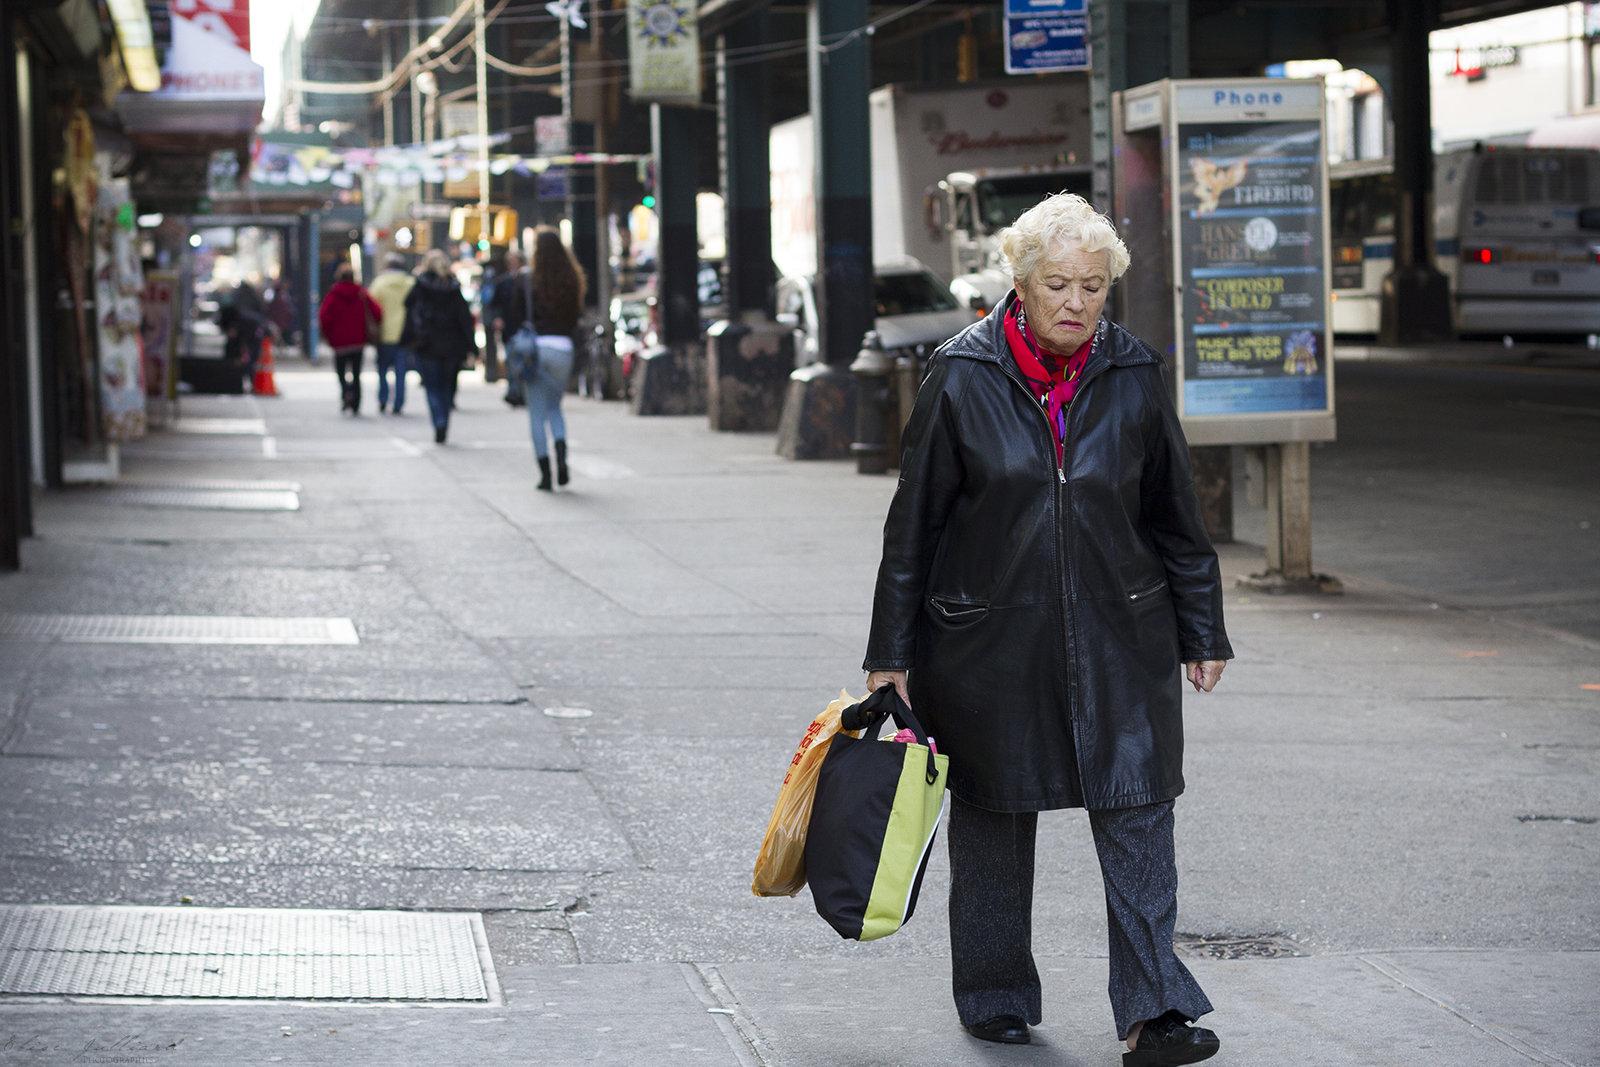 elise-julliard-photographe-new-york-etats-unis-usa-portrait-de-rue-7